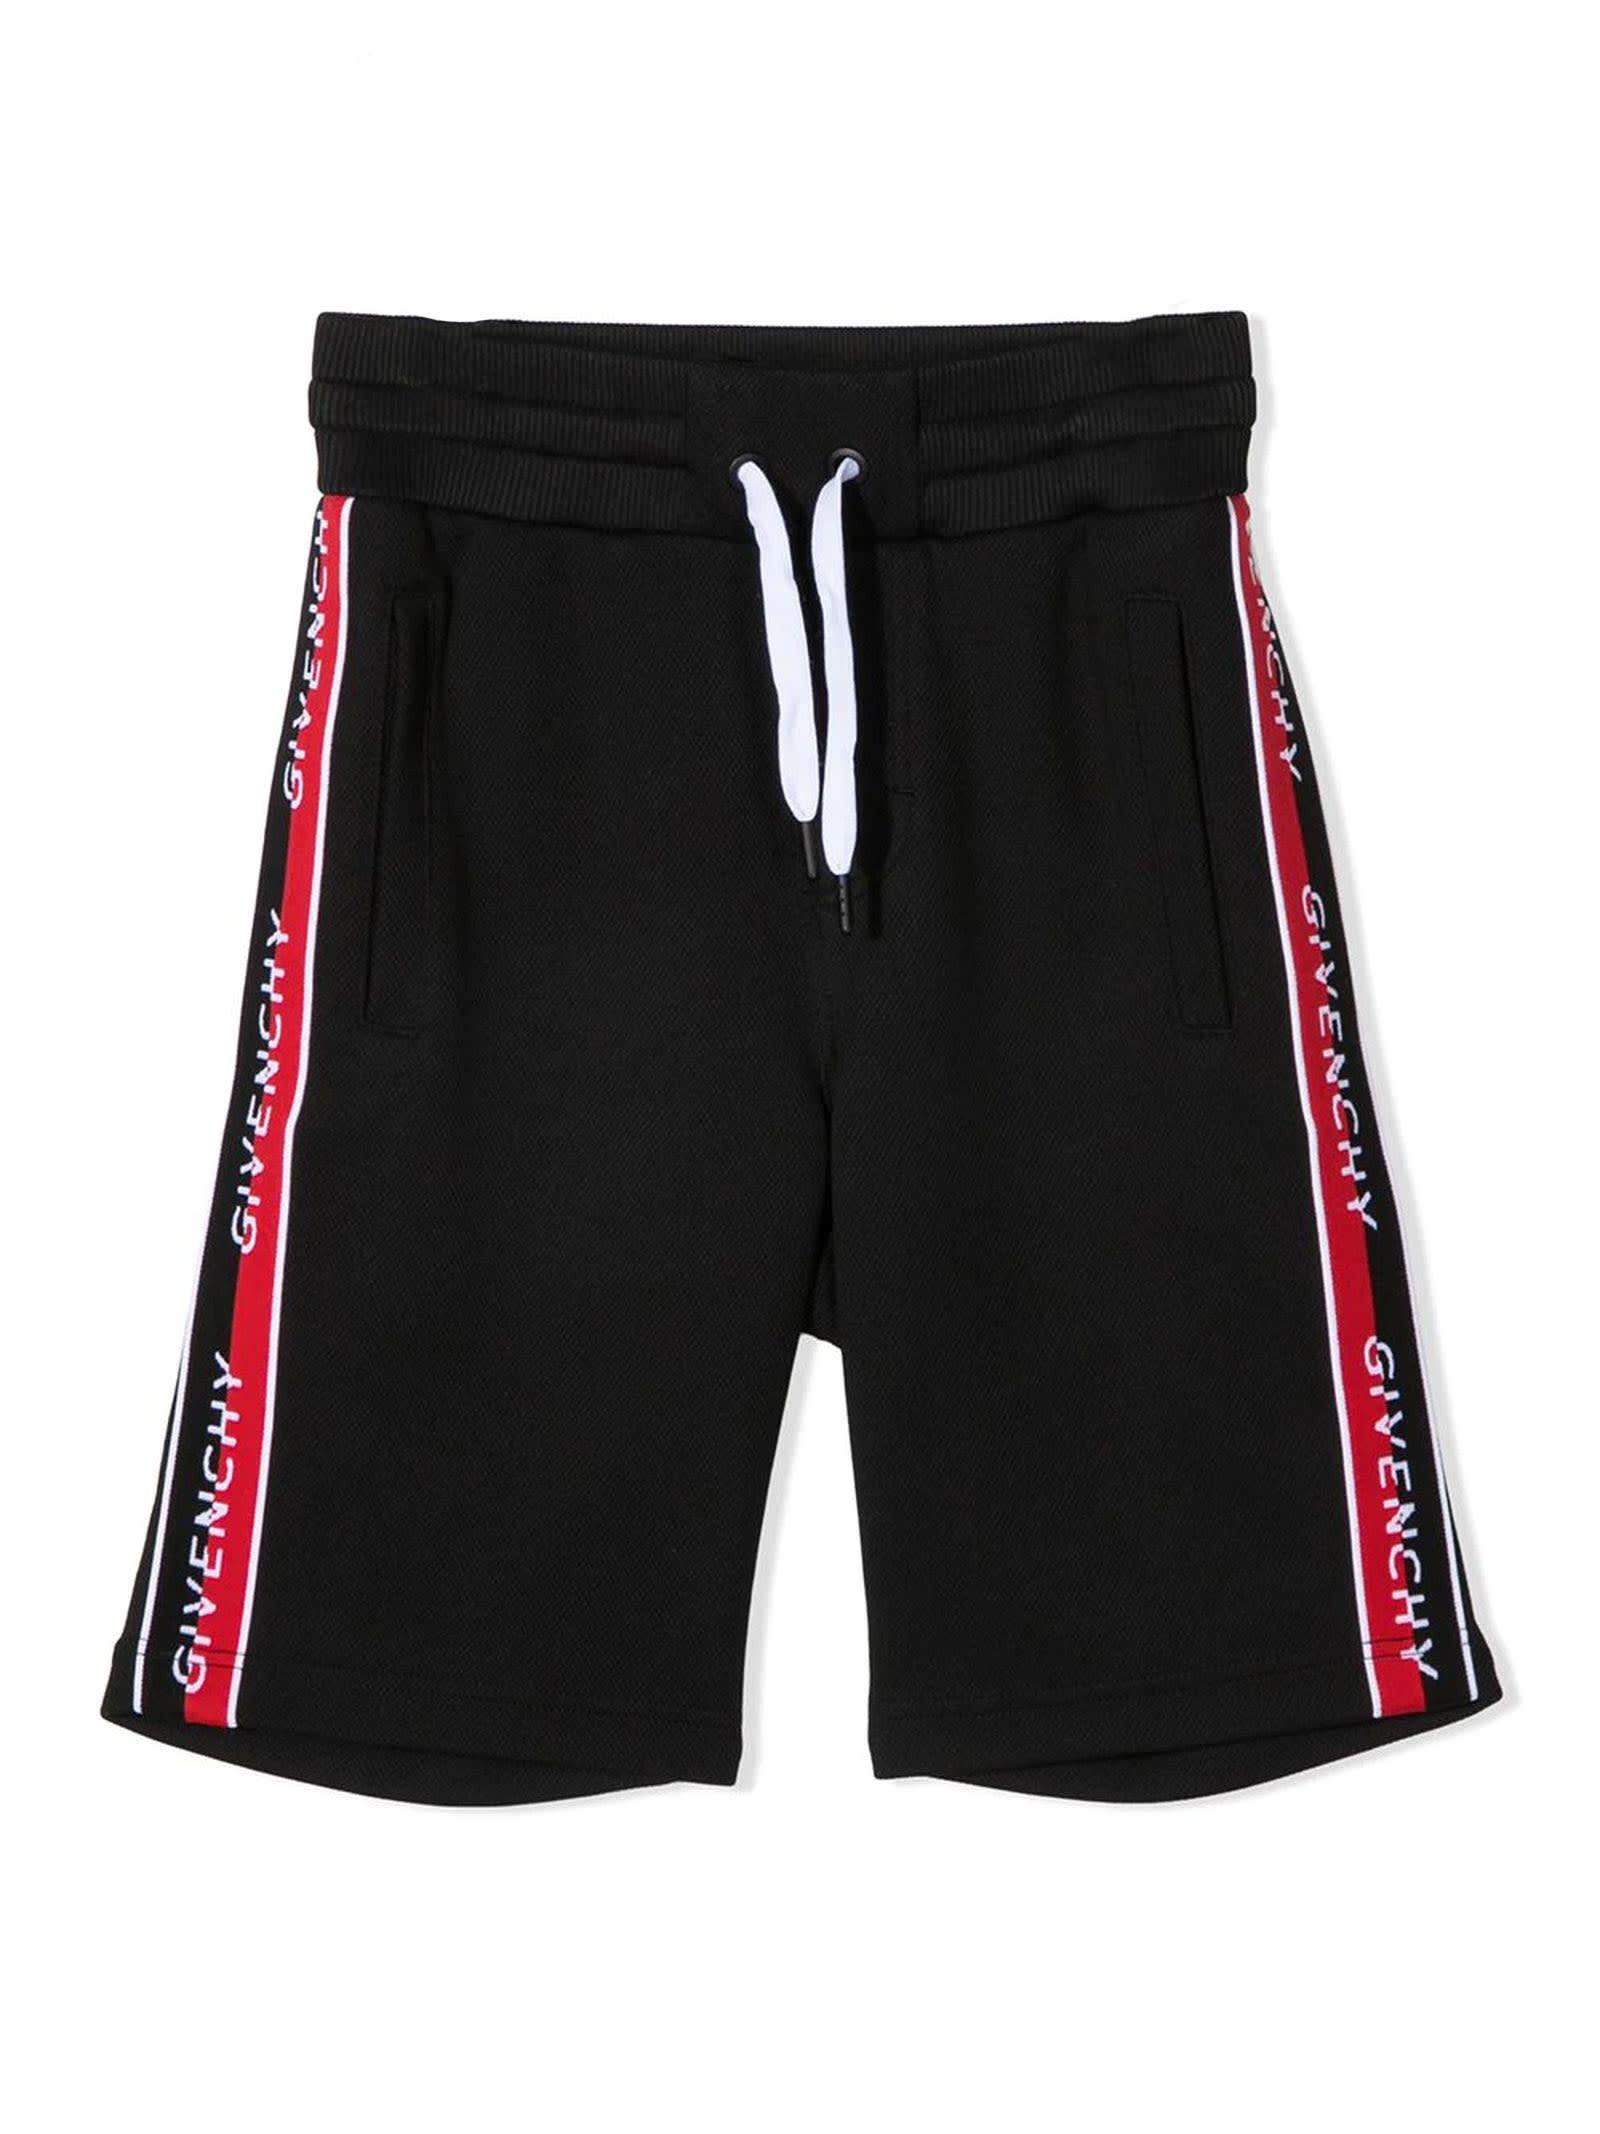 Givenchy Shorts BLACK COTTON-BLEND TRACK SHORTS